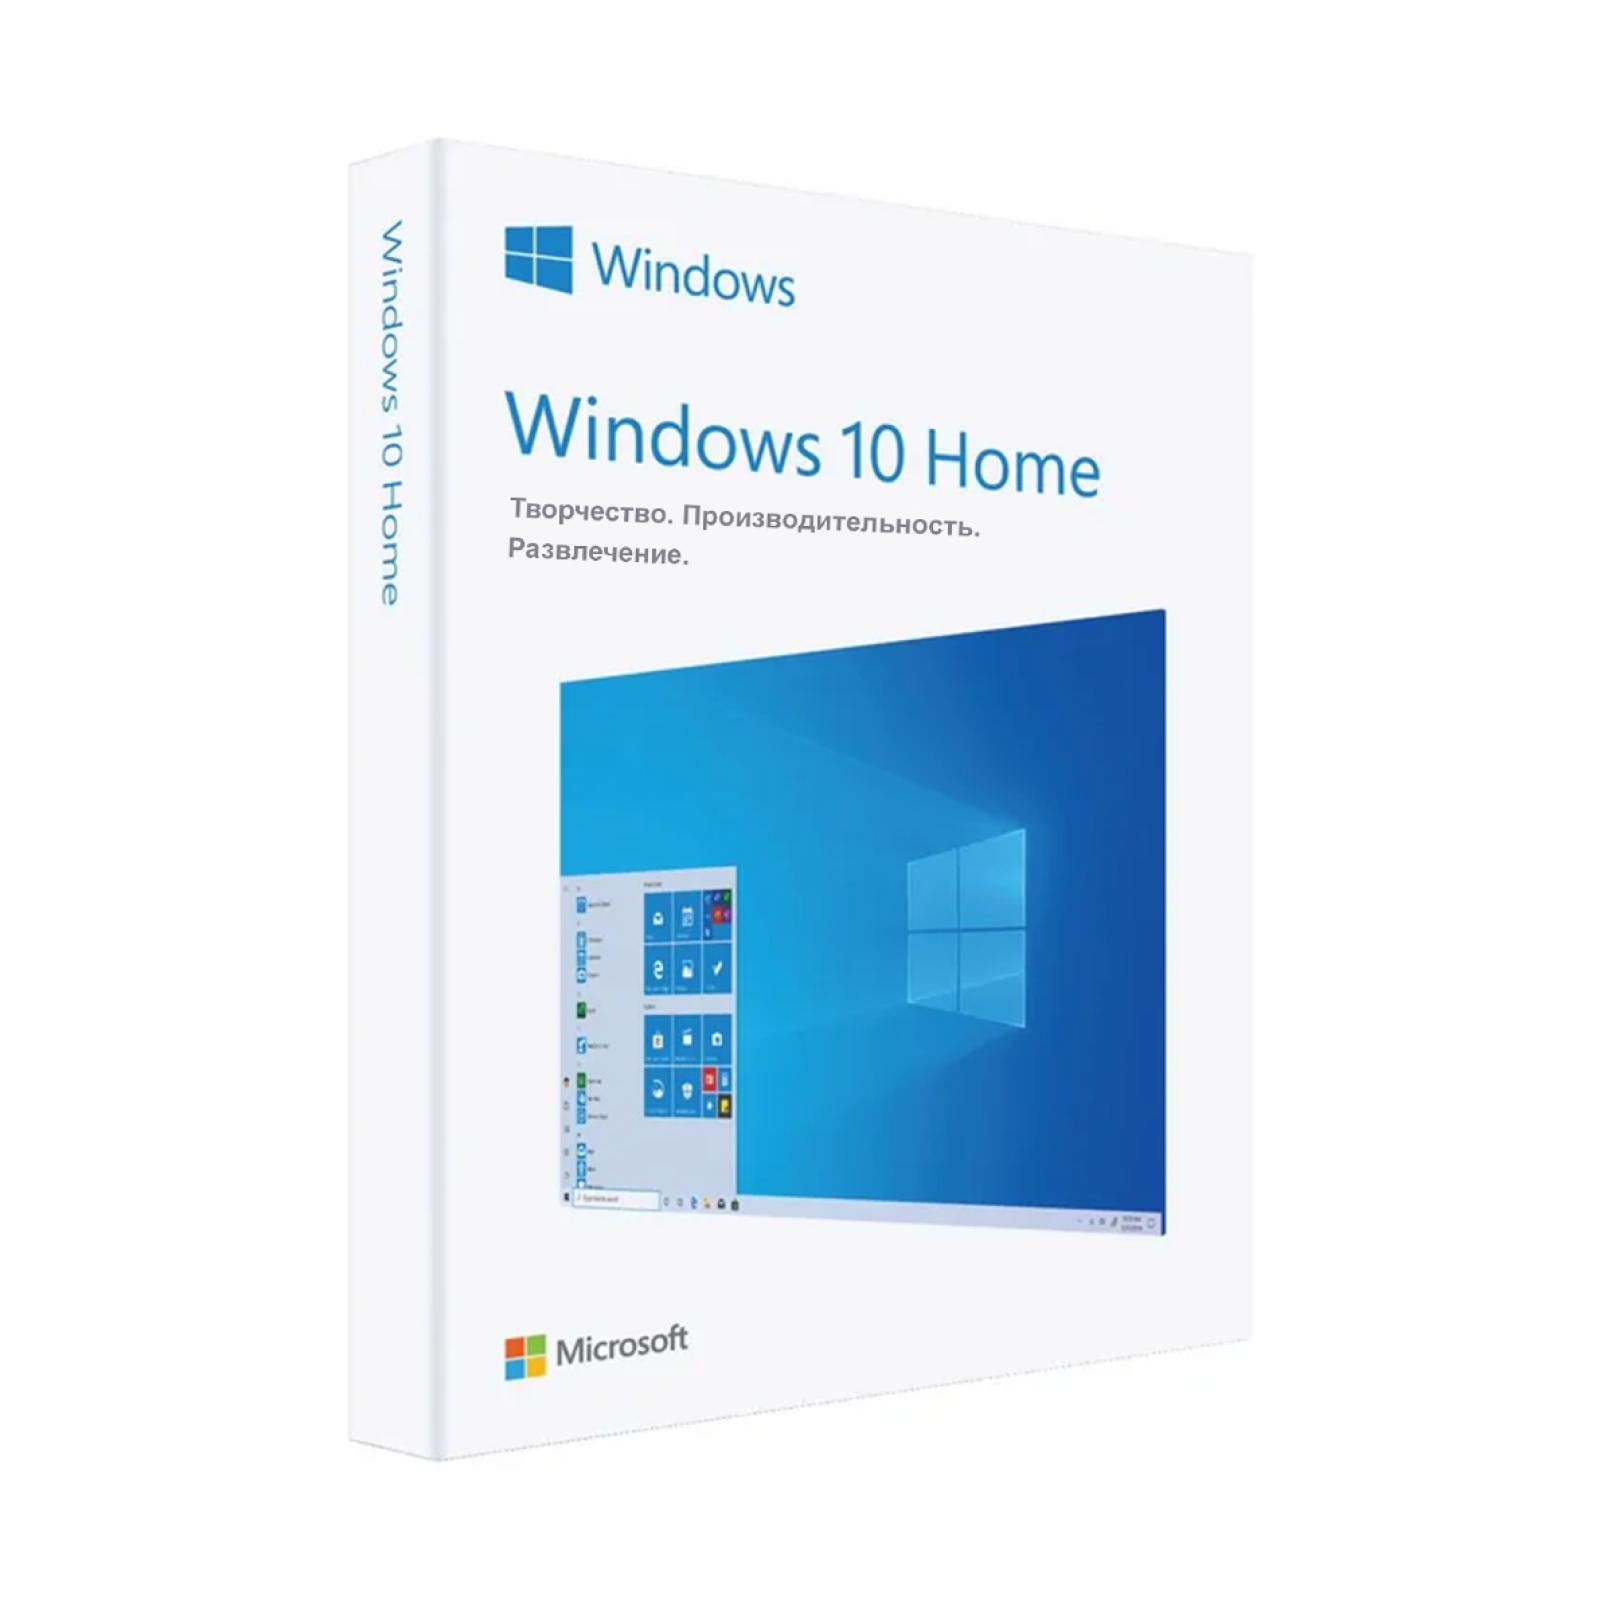 Windows 10 Home (Домашняя) для 2 ПК